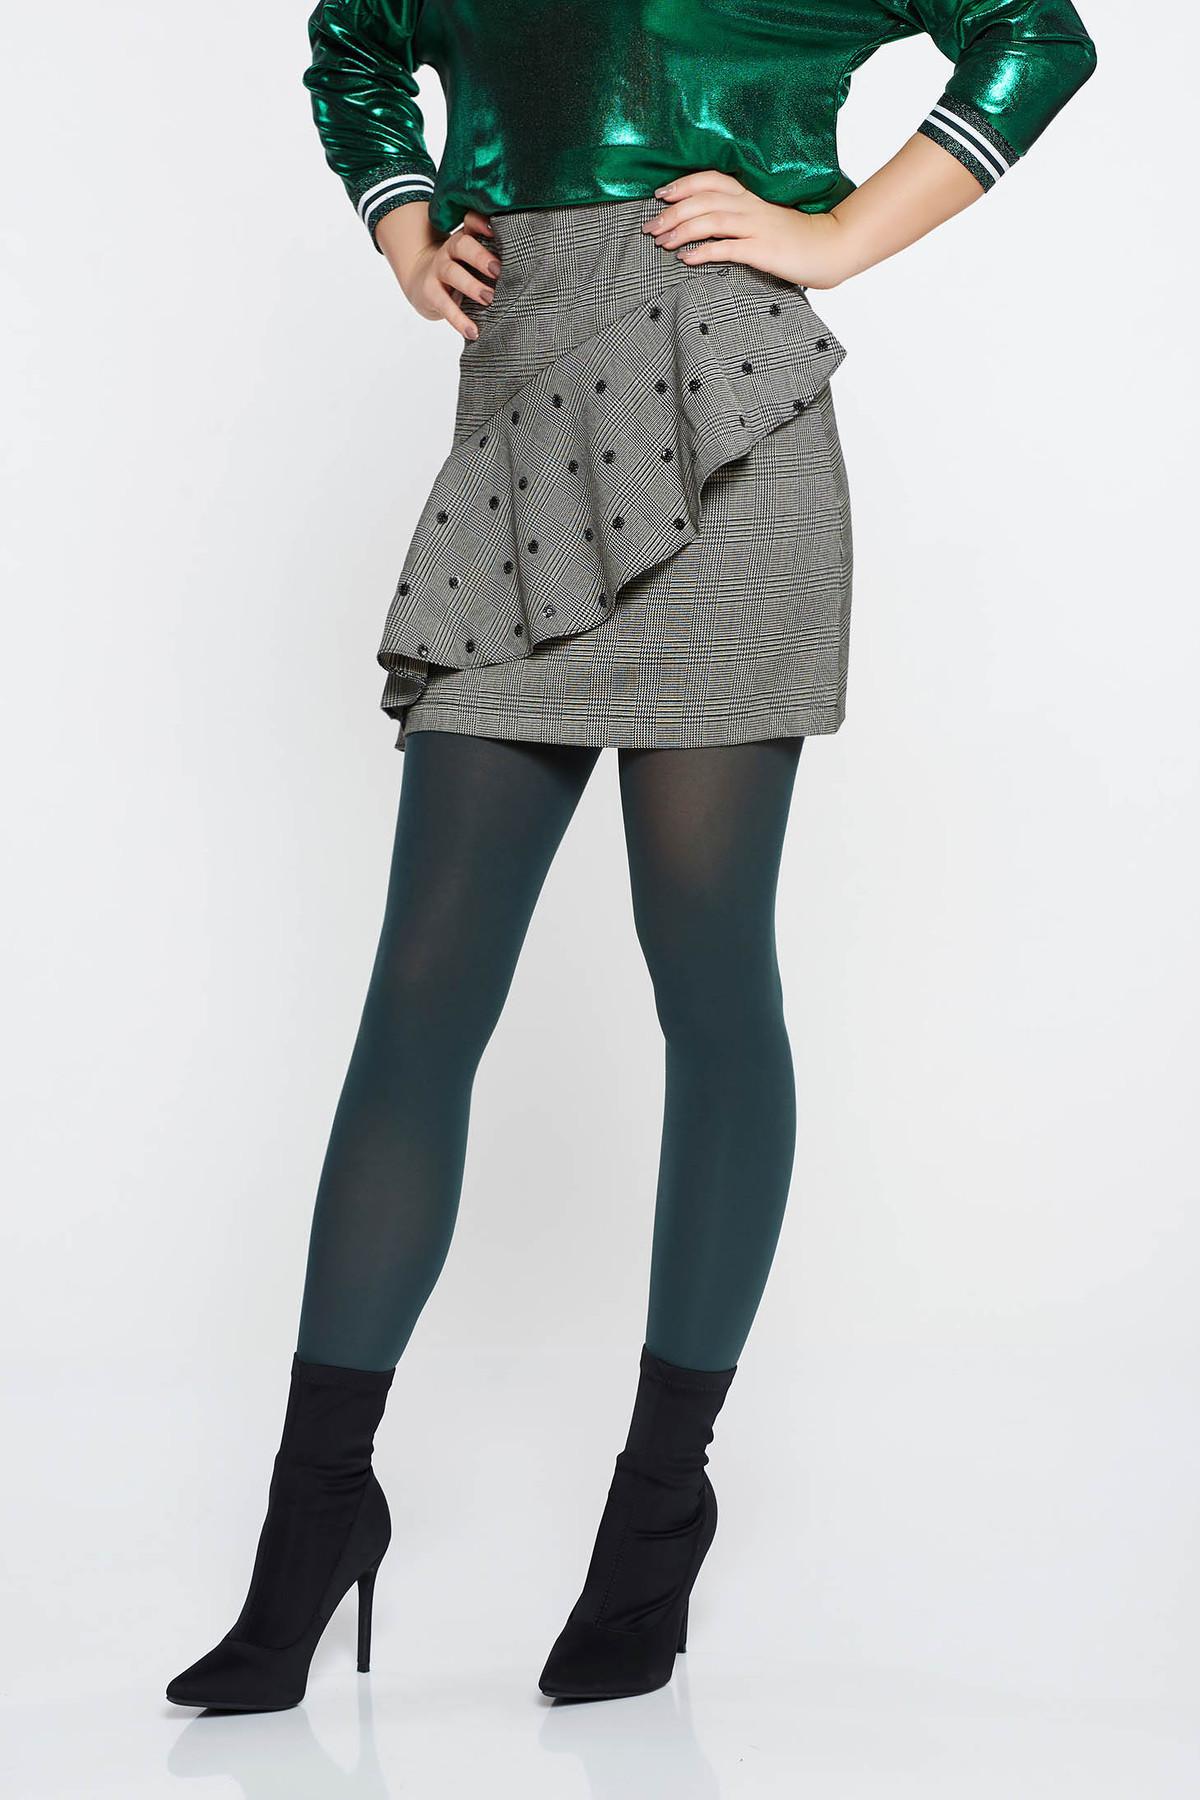 Fusta LaDonna gri casual din stofa usor elastica cu volanase si aplicatii cu paiete